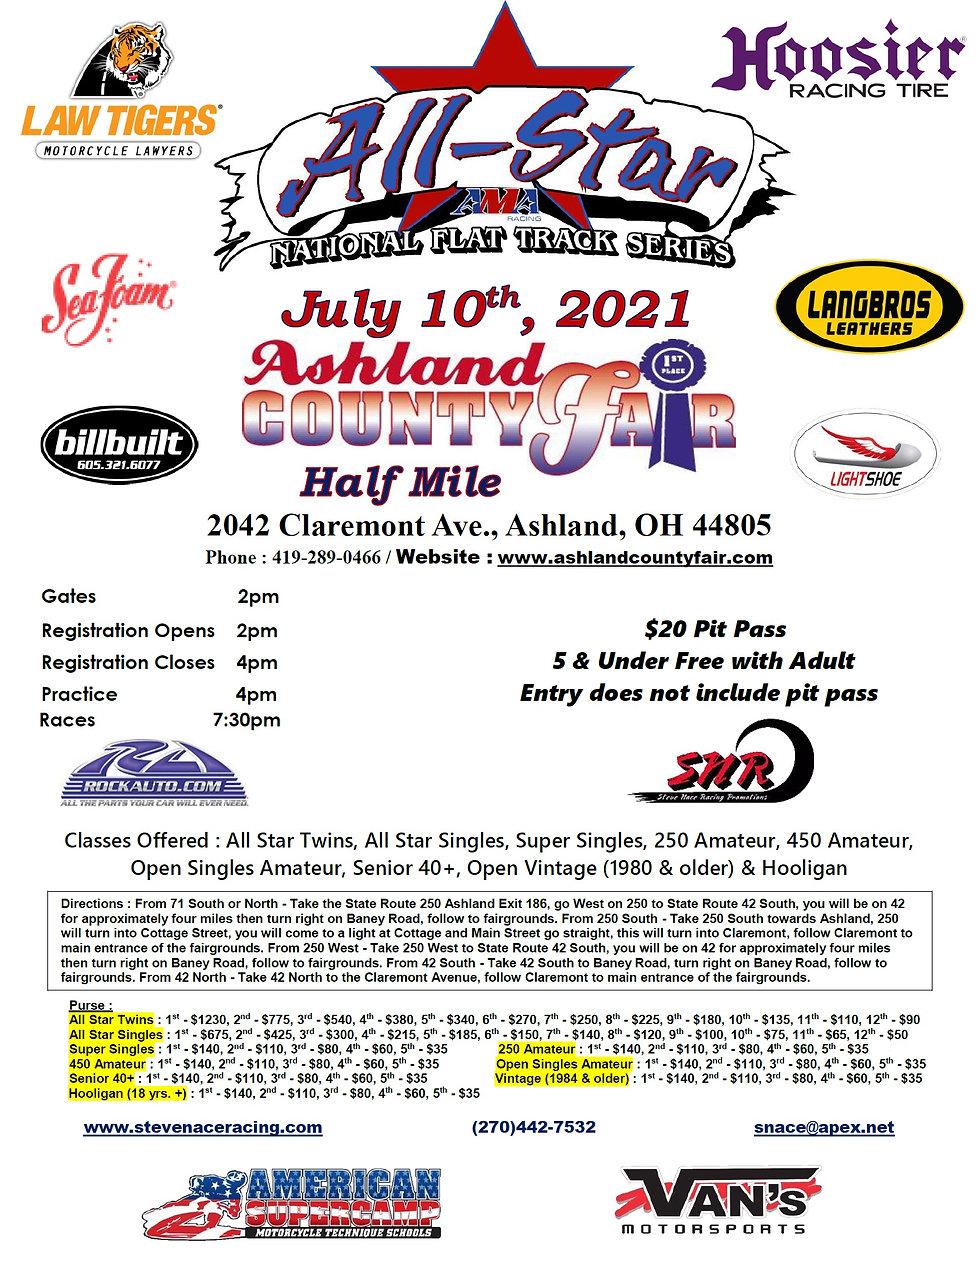 Ashland All Star flyer.jpg